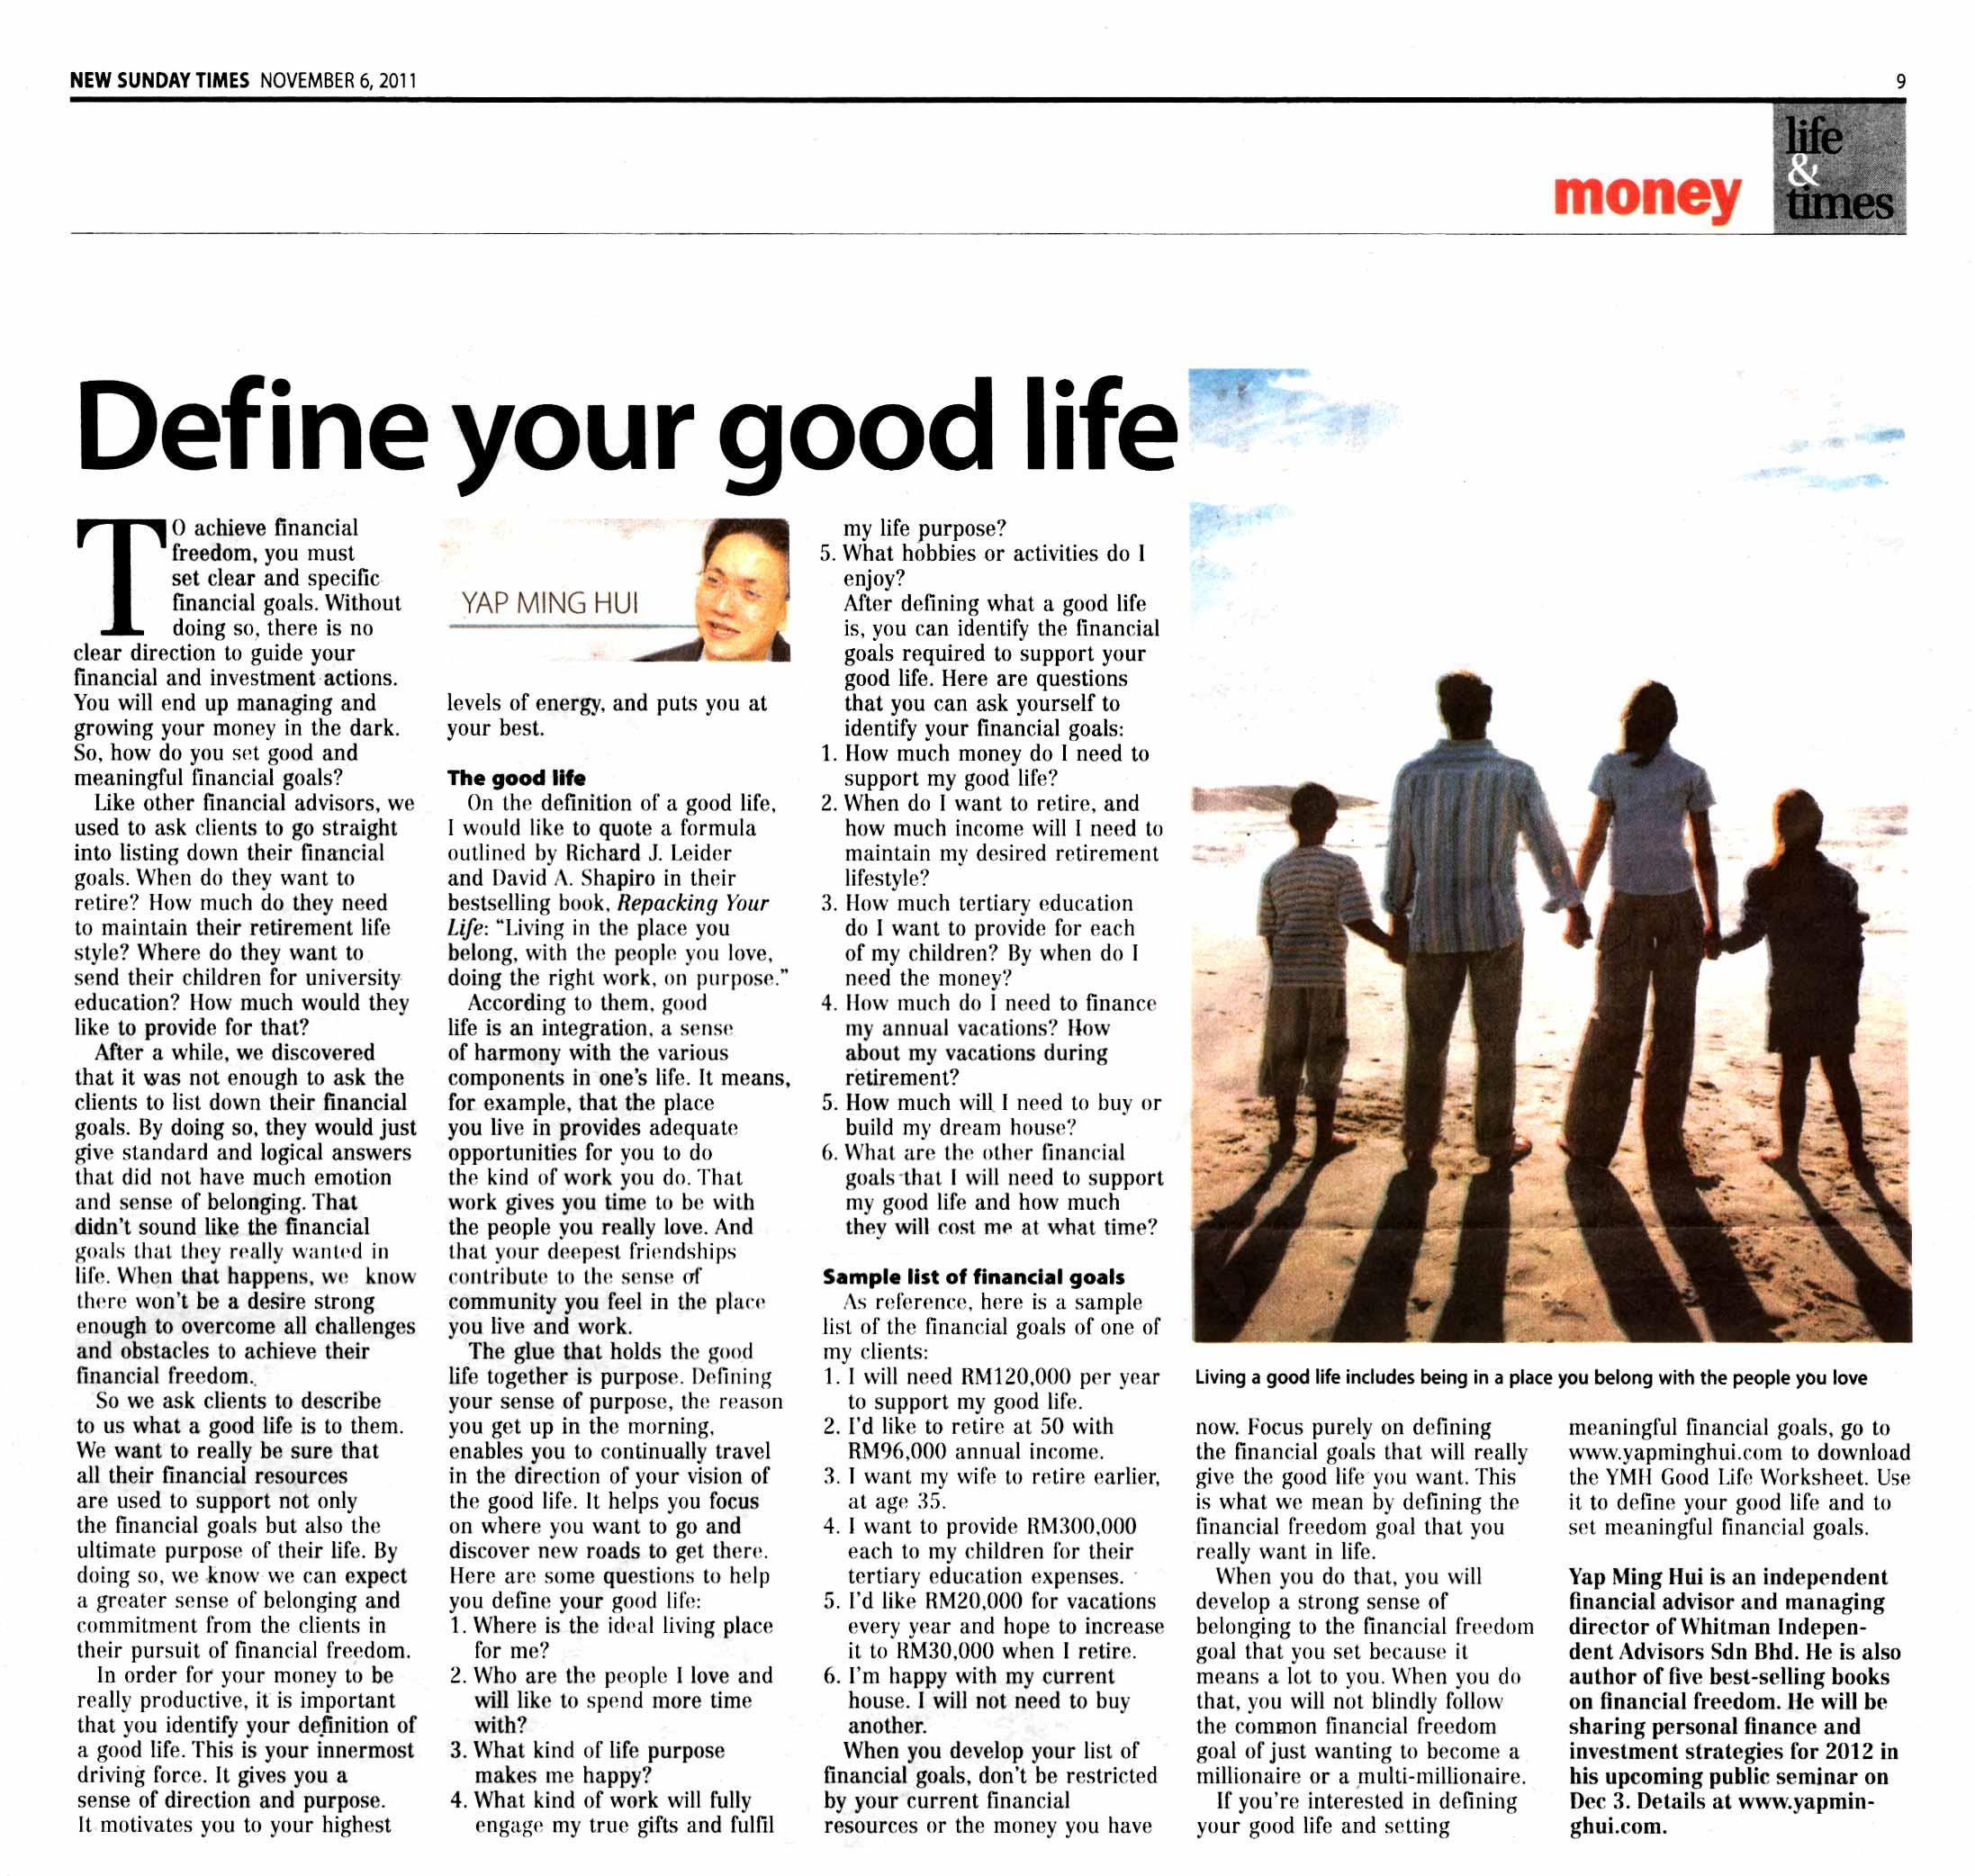 Define Your Good Life - 06 Nov 2011